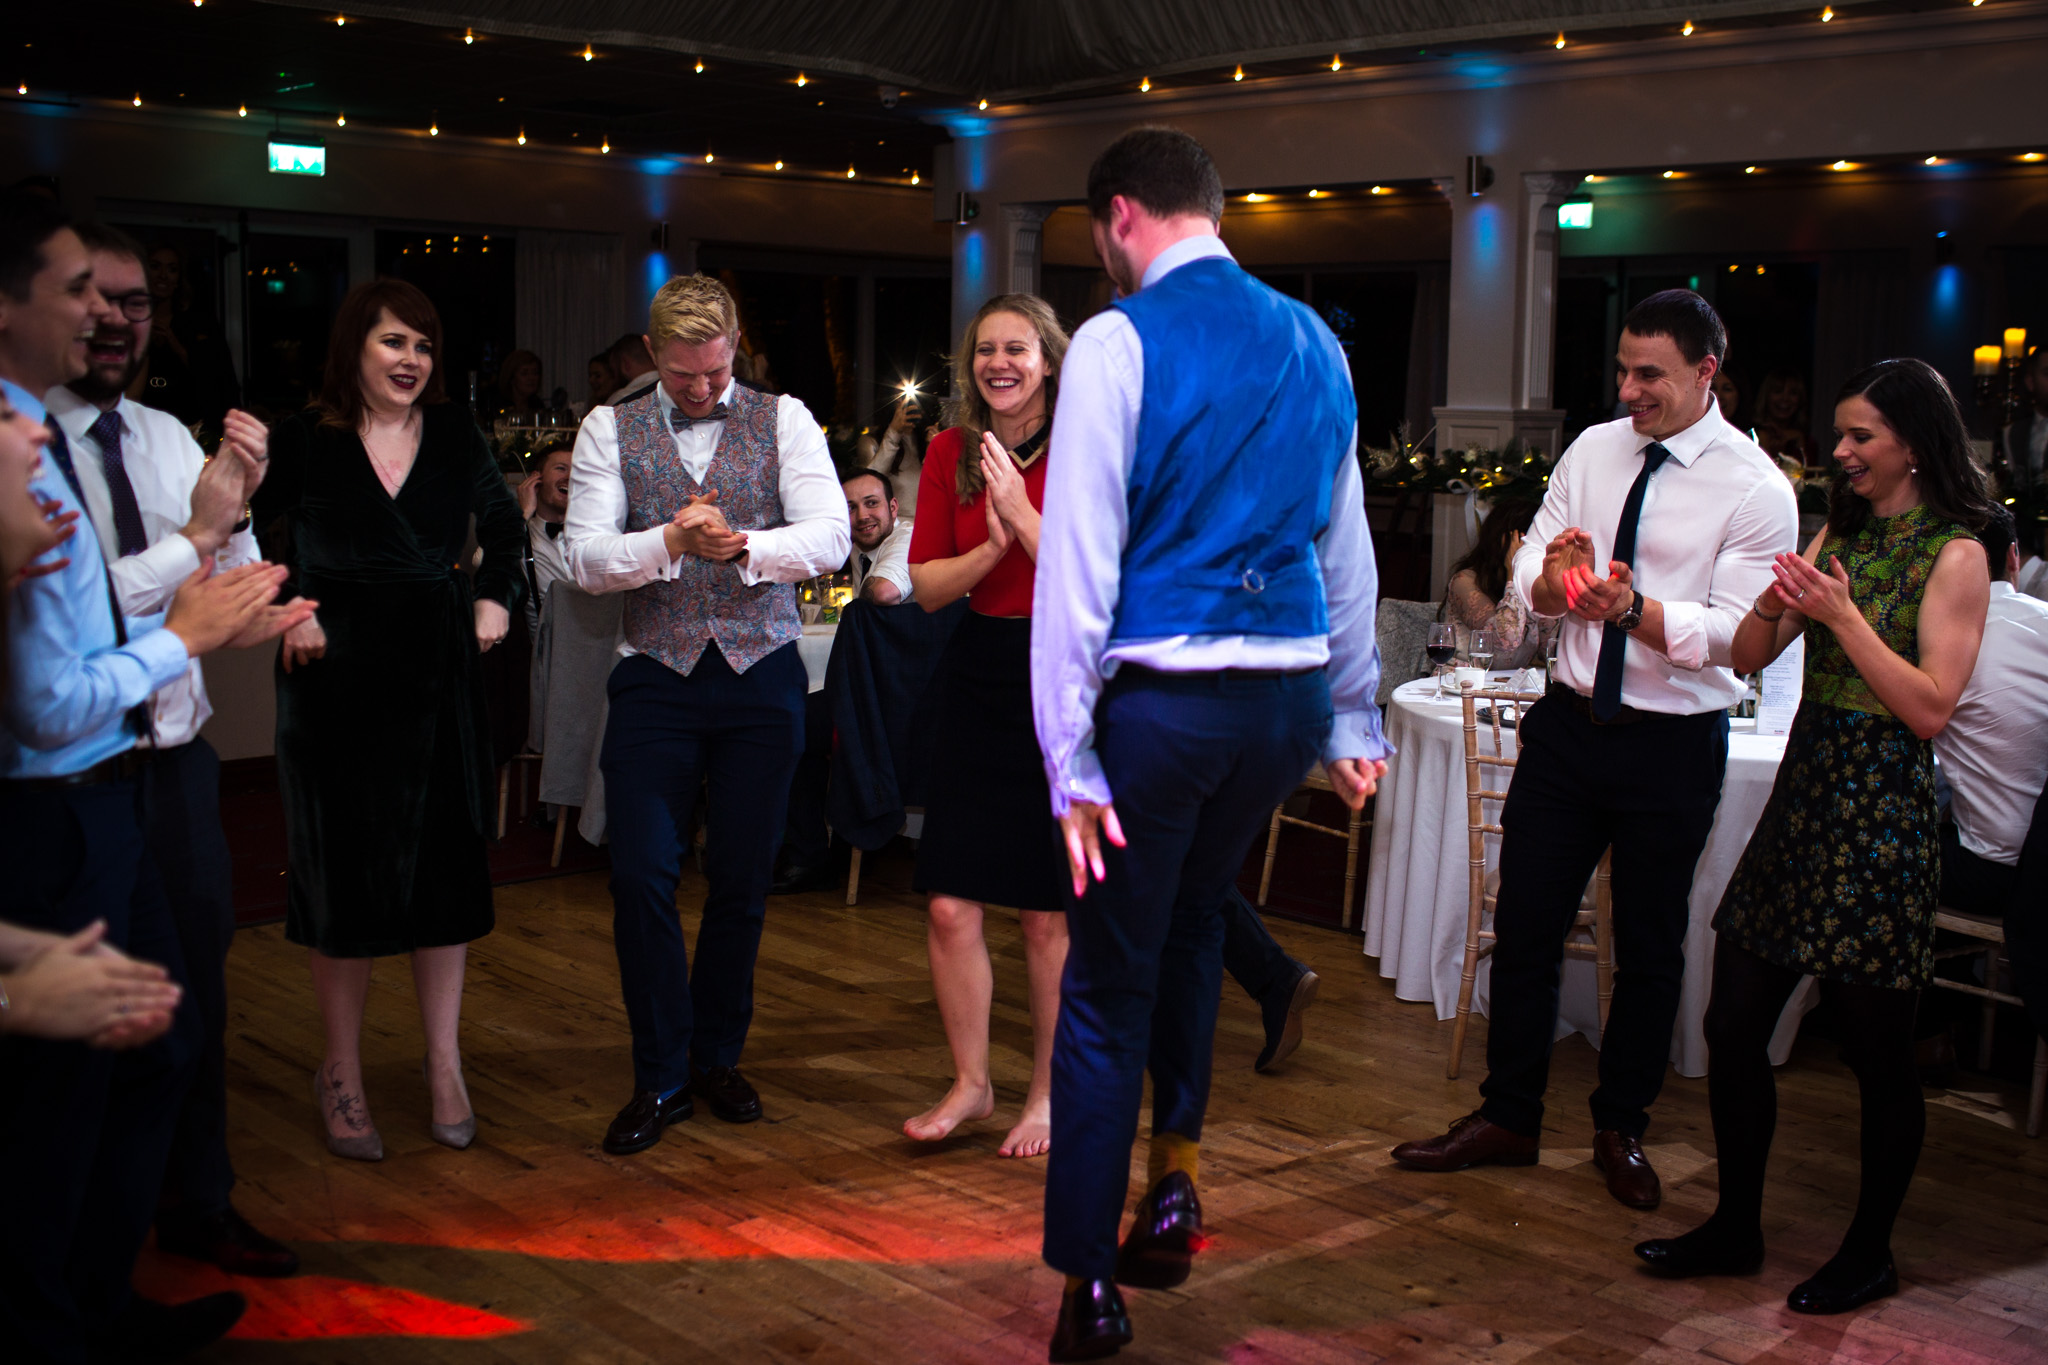 Mark_Barnes_Northern_Ireland_wedding_photographer_Harveys_Point_Donegall_Wedding_photography-Adam&Gemma-65.jpg